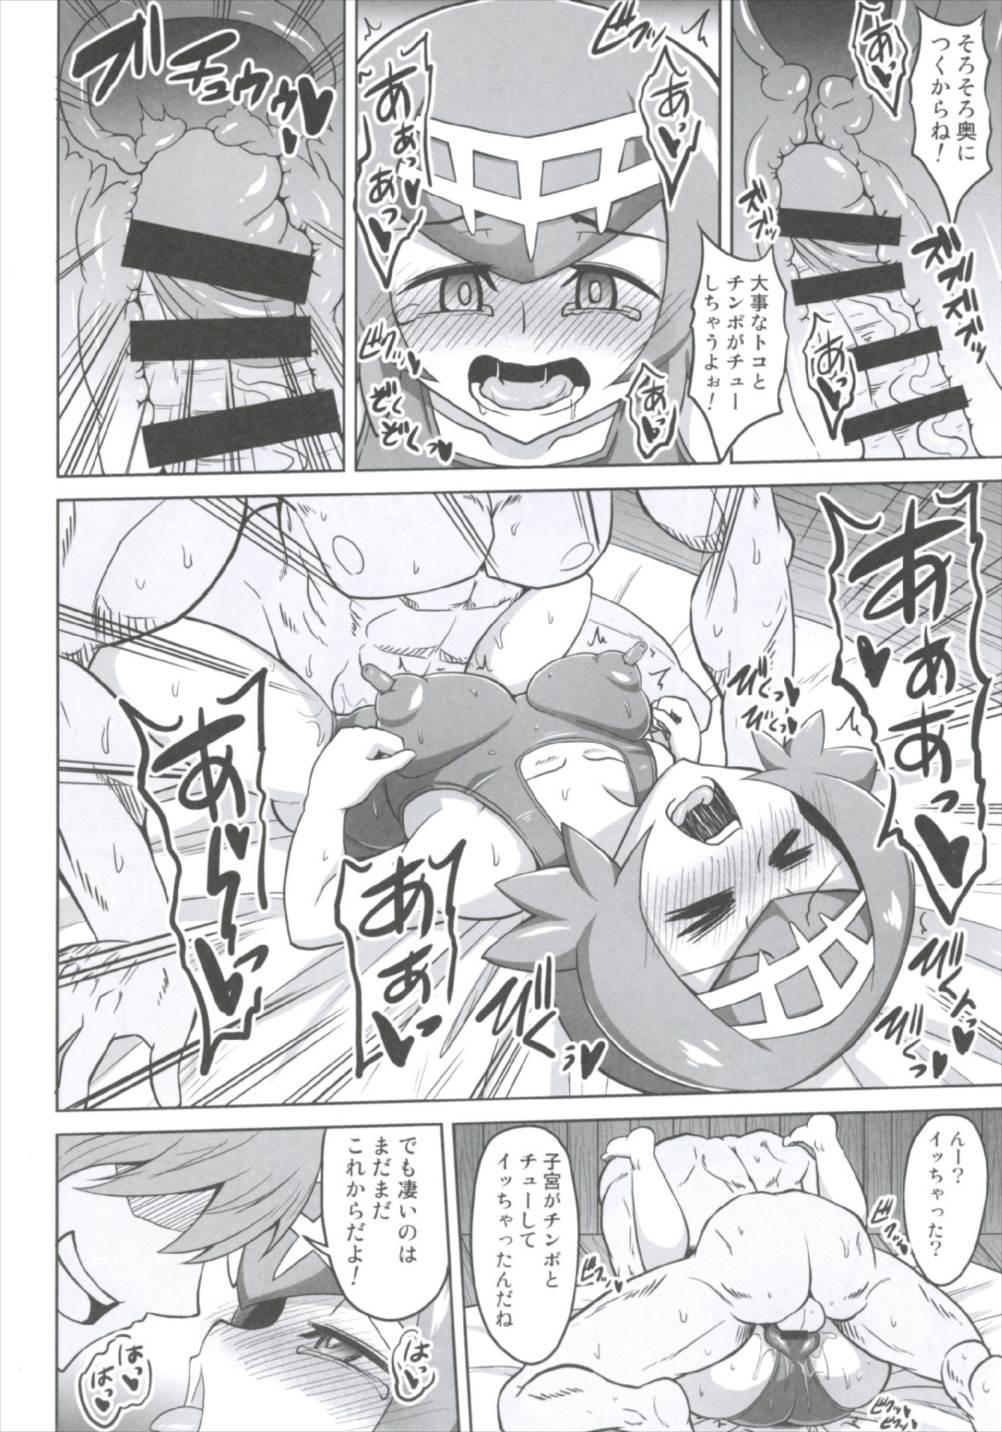 (C92) [Forever and ever (Eisen)] BOKKIMON -Suiren-chan wa H ni Kyoumi Shinshin- (Pokémon Sun and Moon) 23